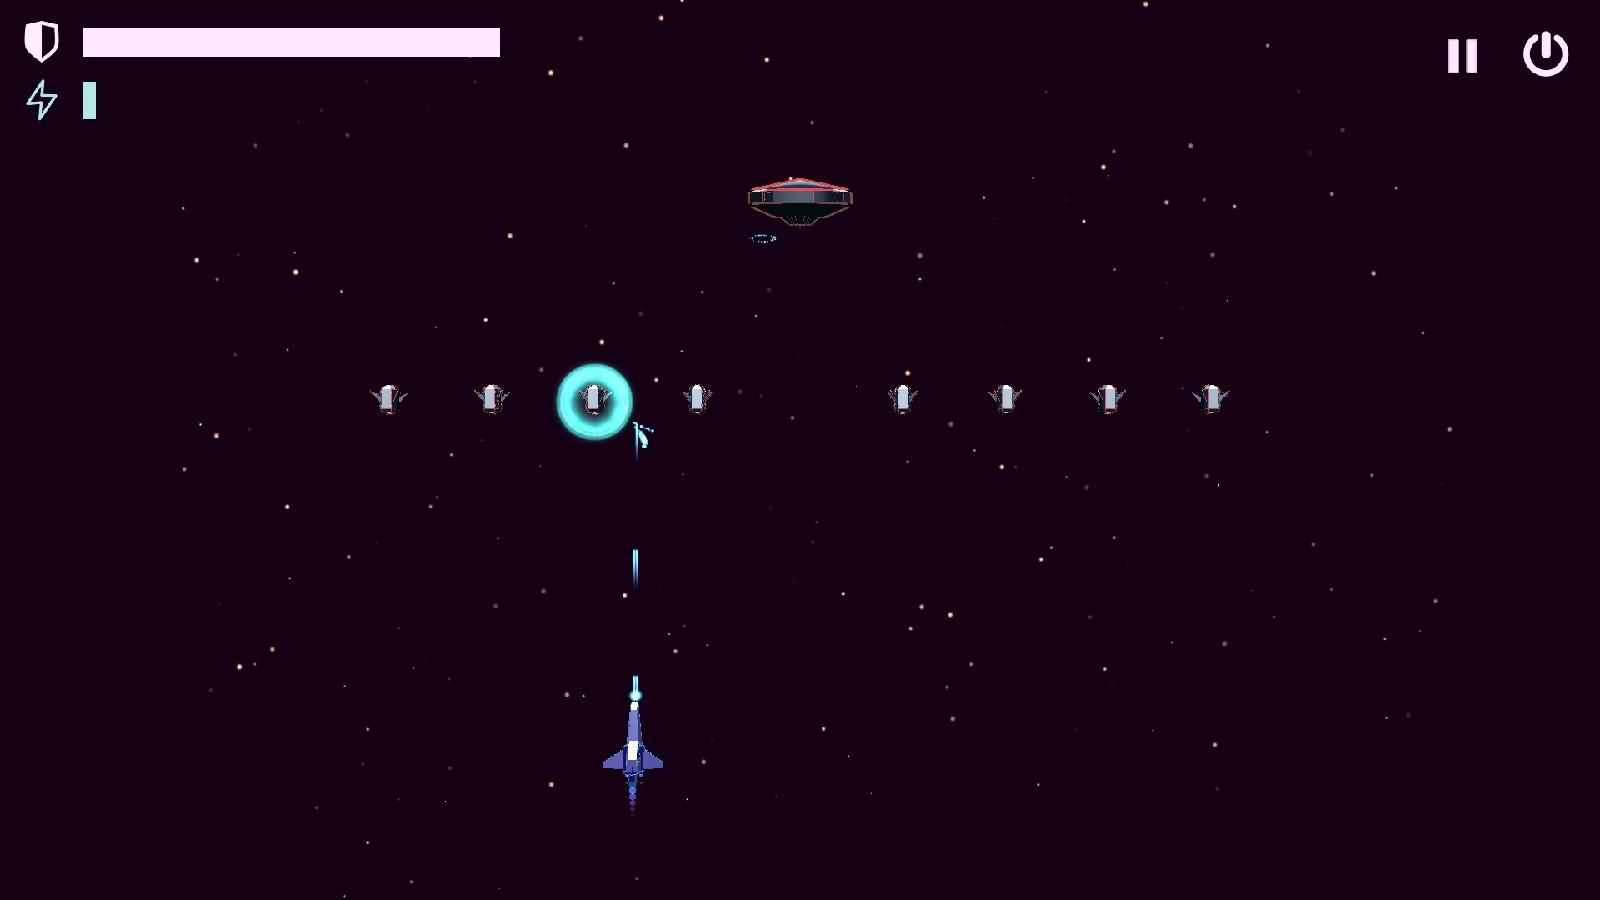 7H_4-mqJSgI | Star Fighter